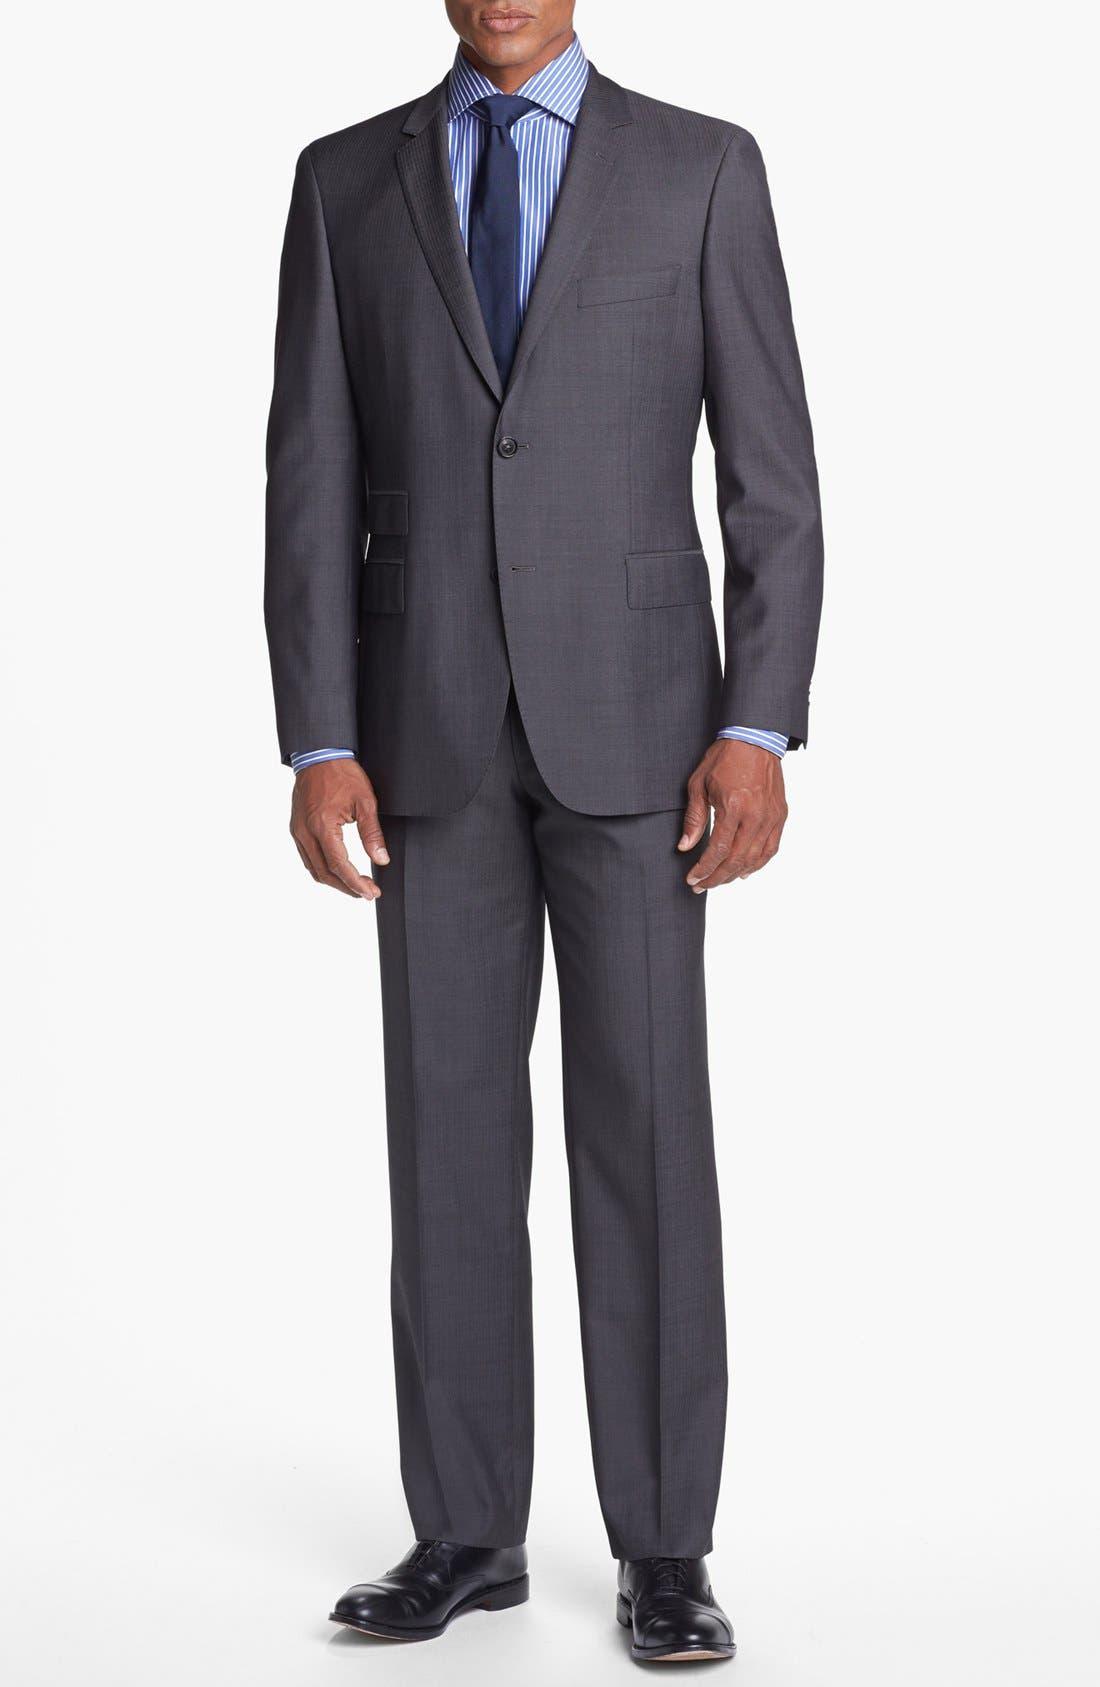 Main Image - BOSS HUGO BOSS 'Edison/Power' Classic Fit Wool Suit